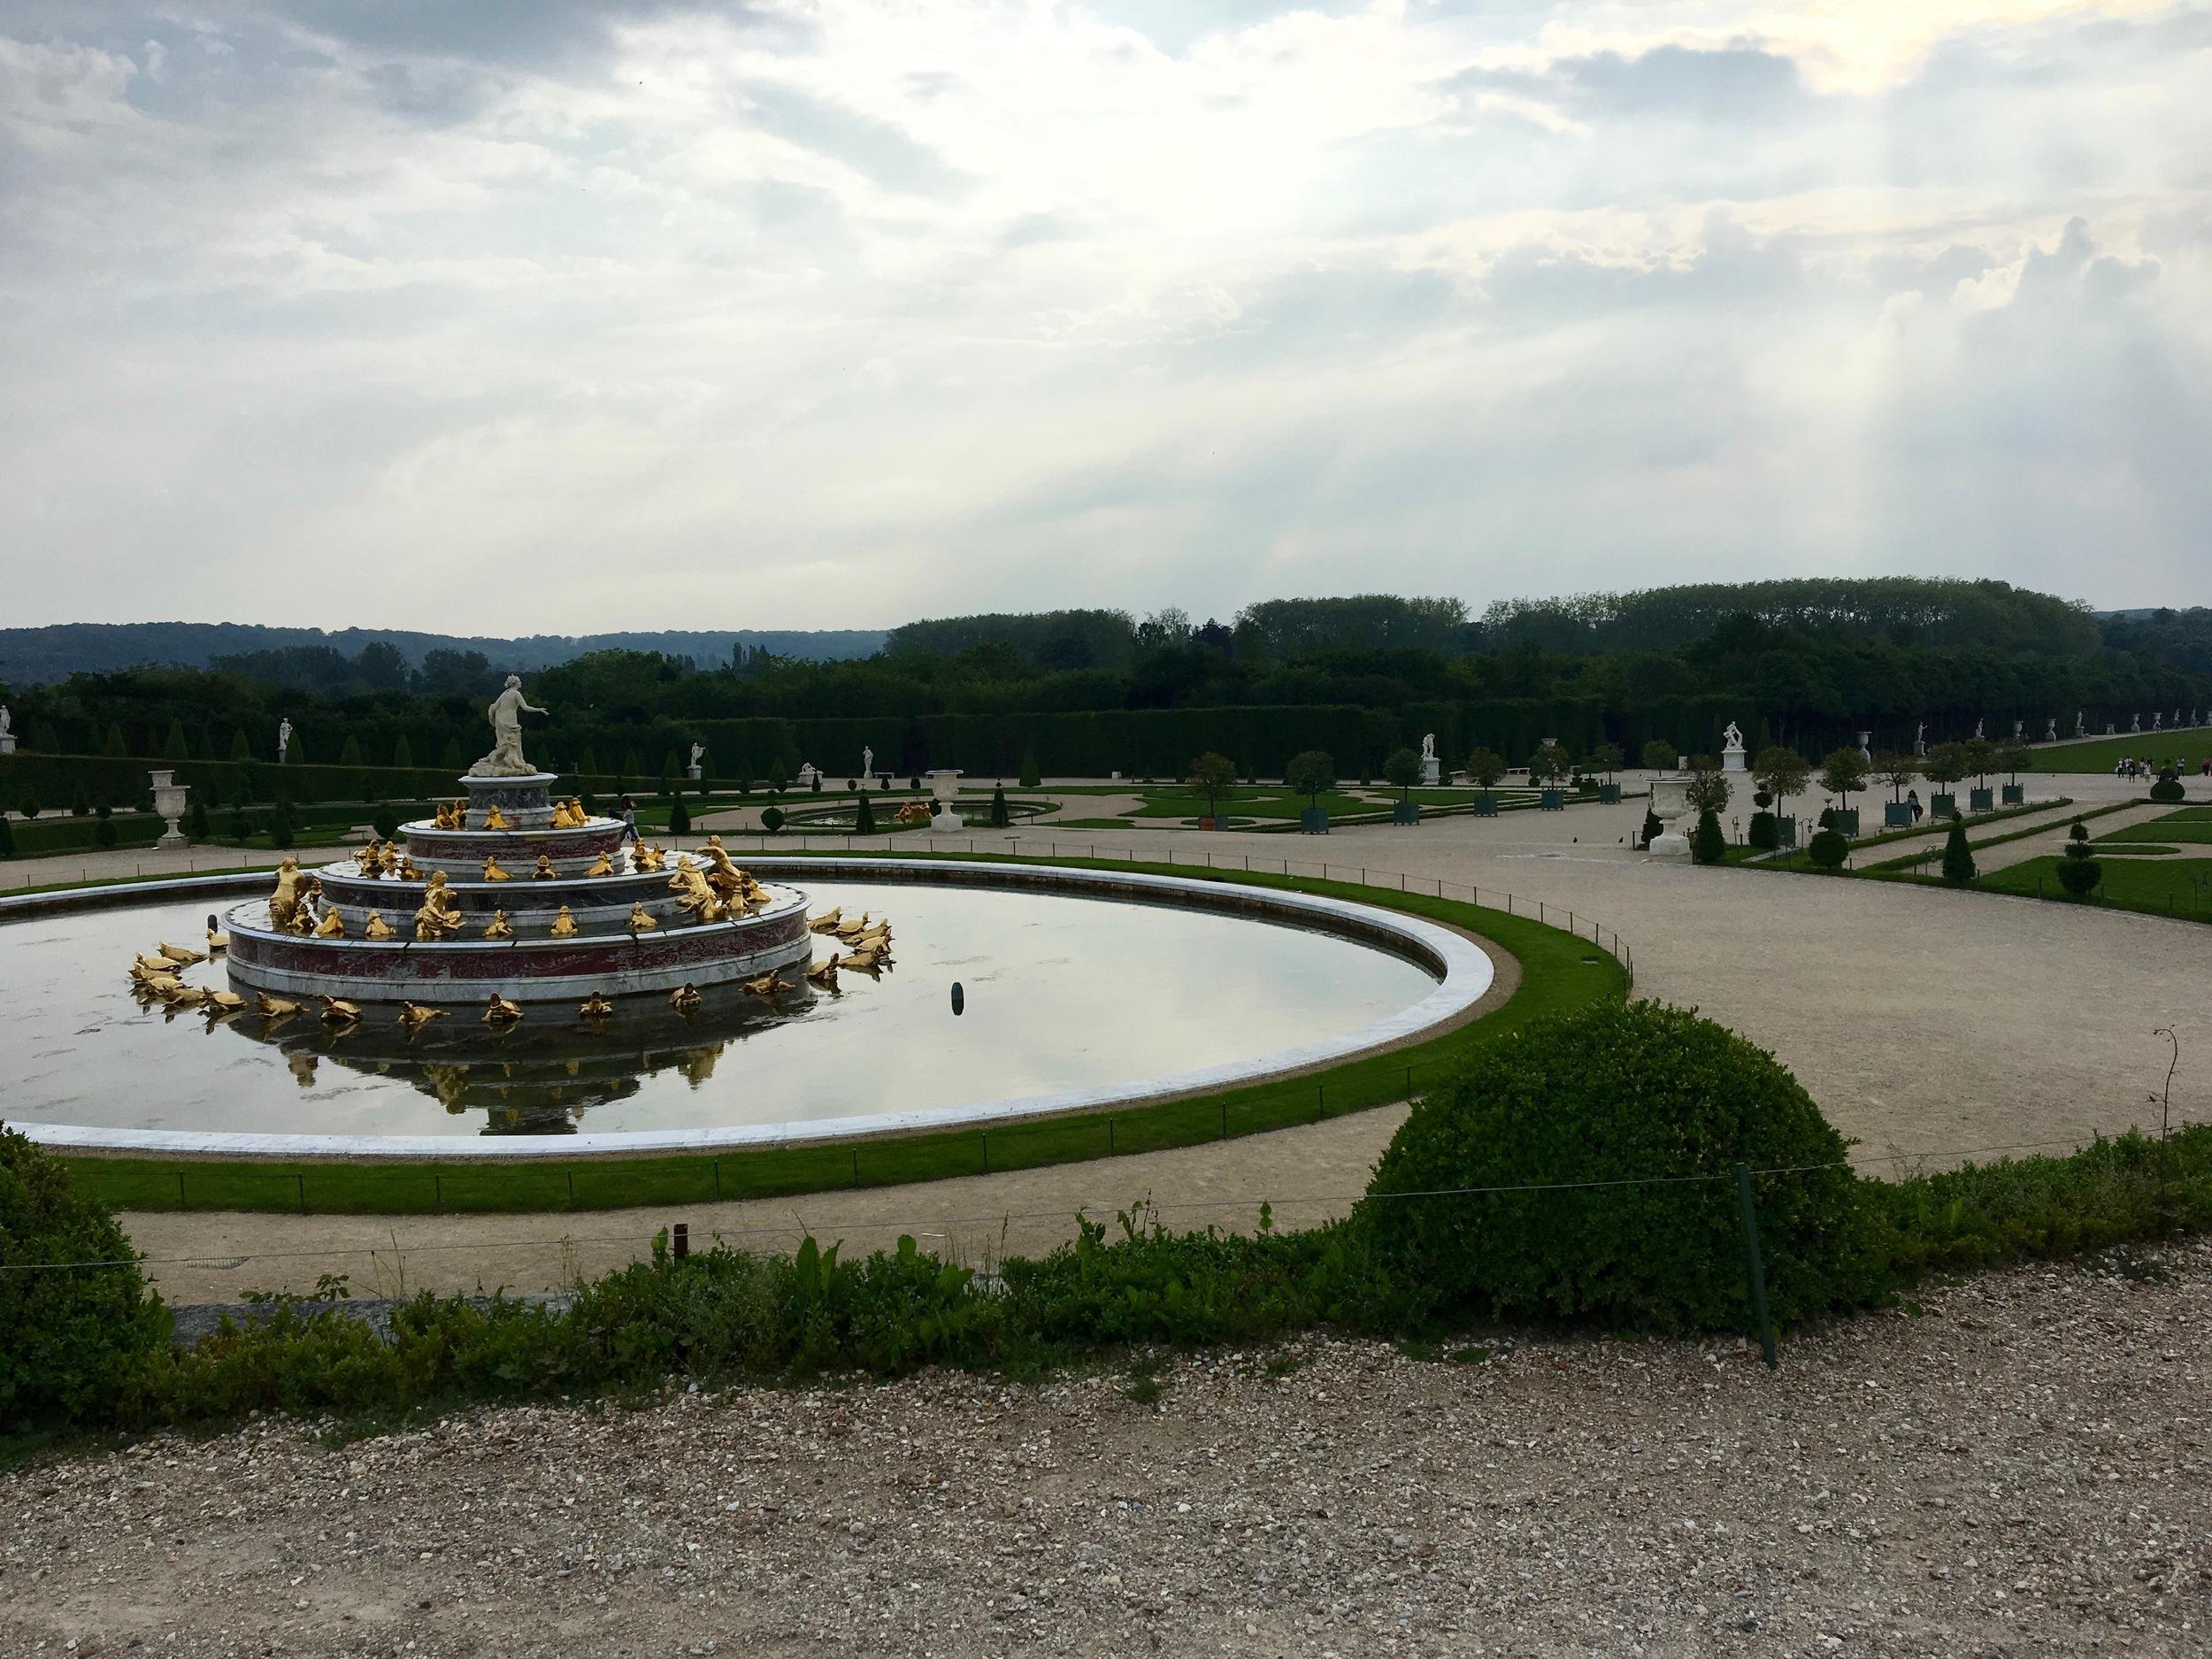 Lotta fountains at Versailles